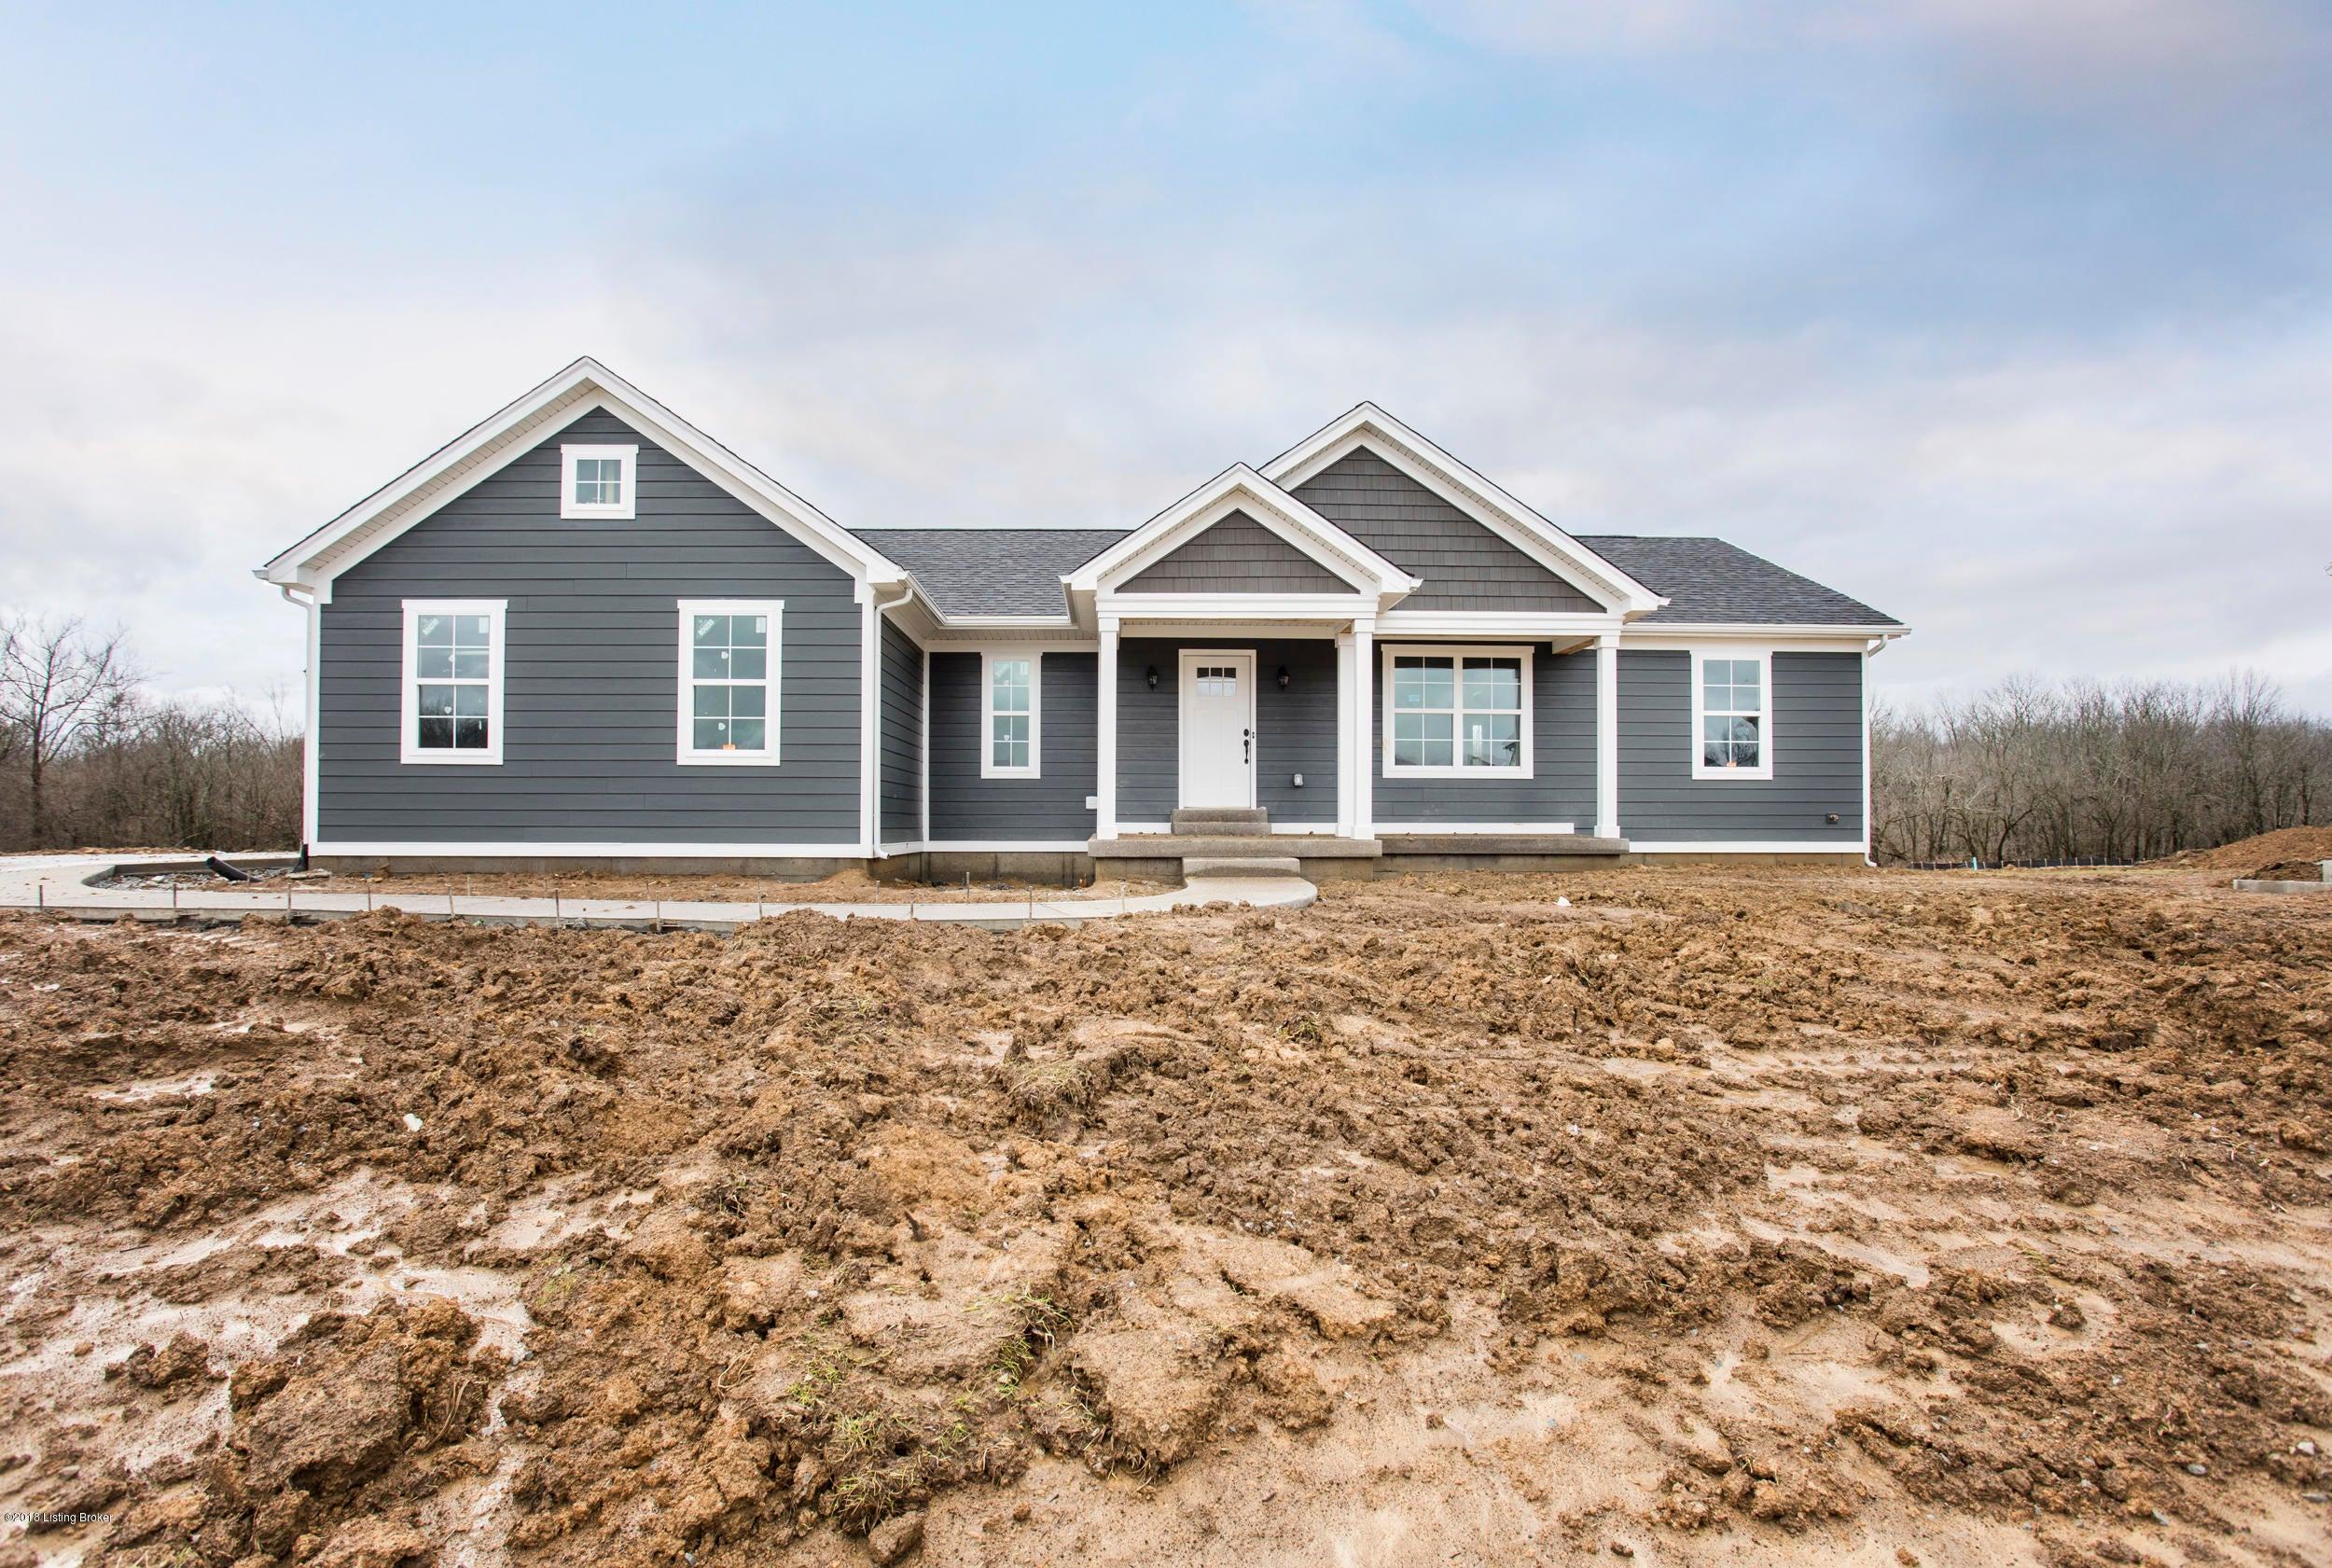 4703 Deer Creek Cir, 61, Smithfield, KY 40068